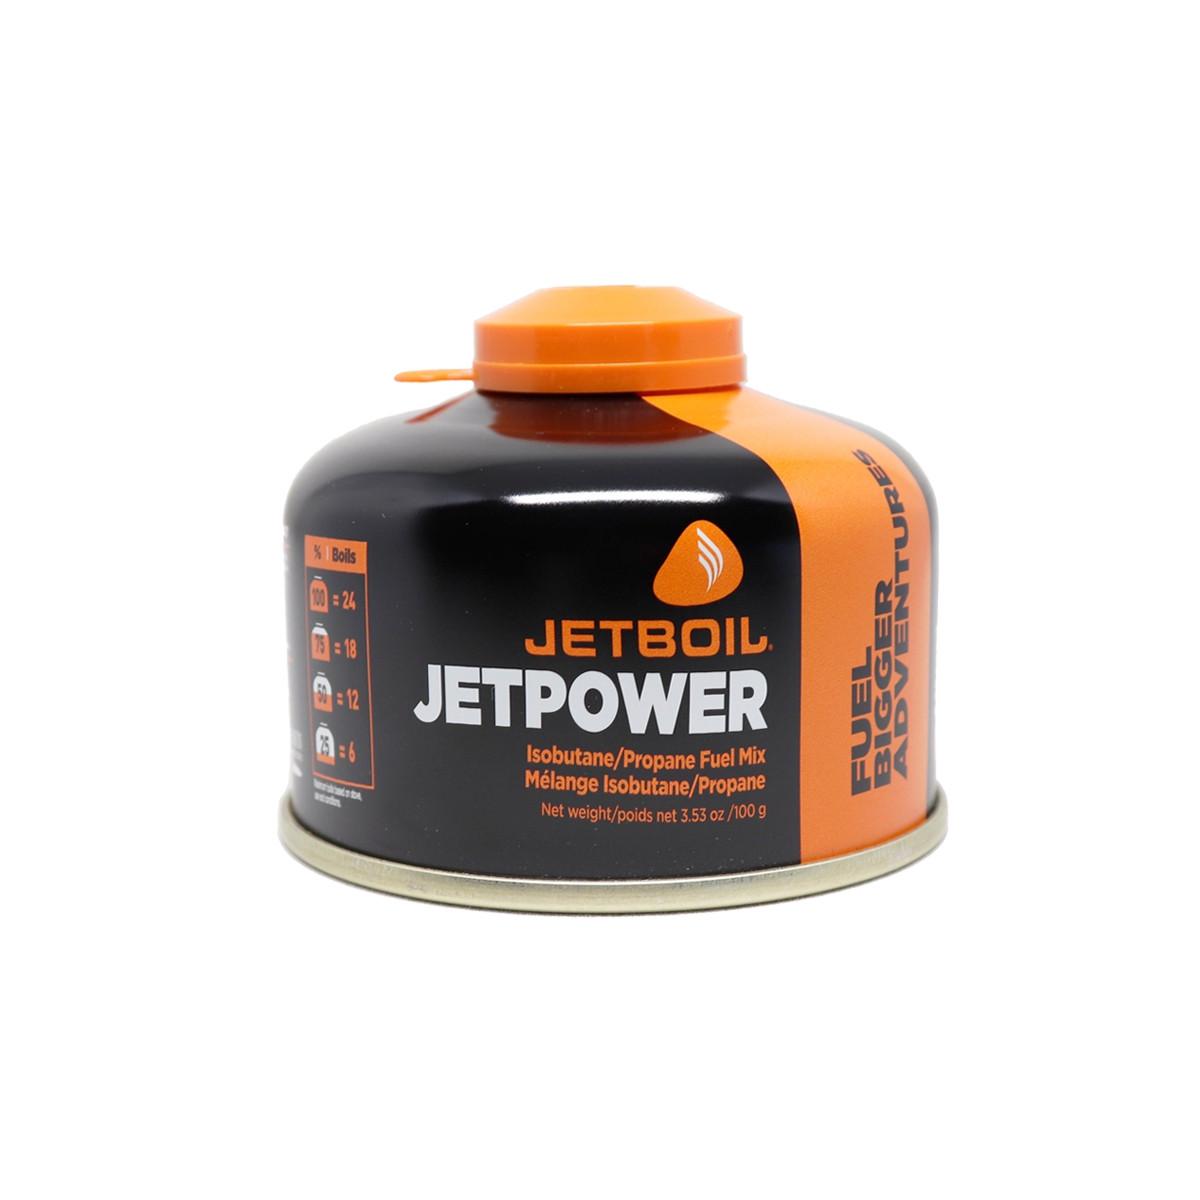 Jetpower Fuel 100G Jetboil